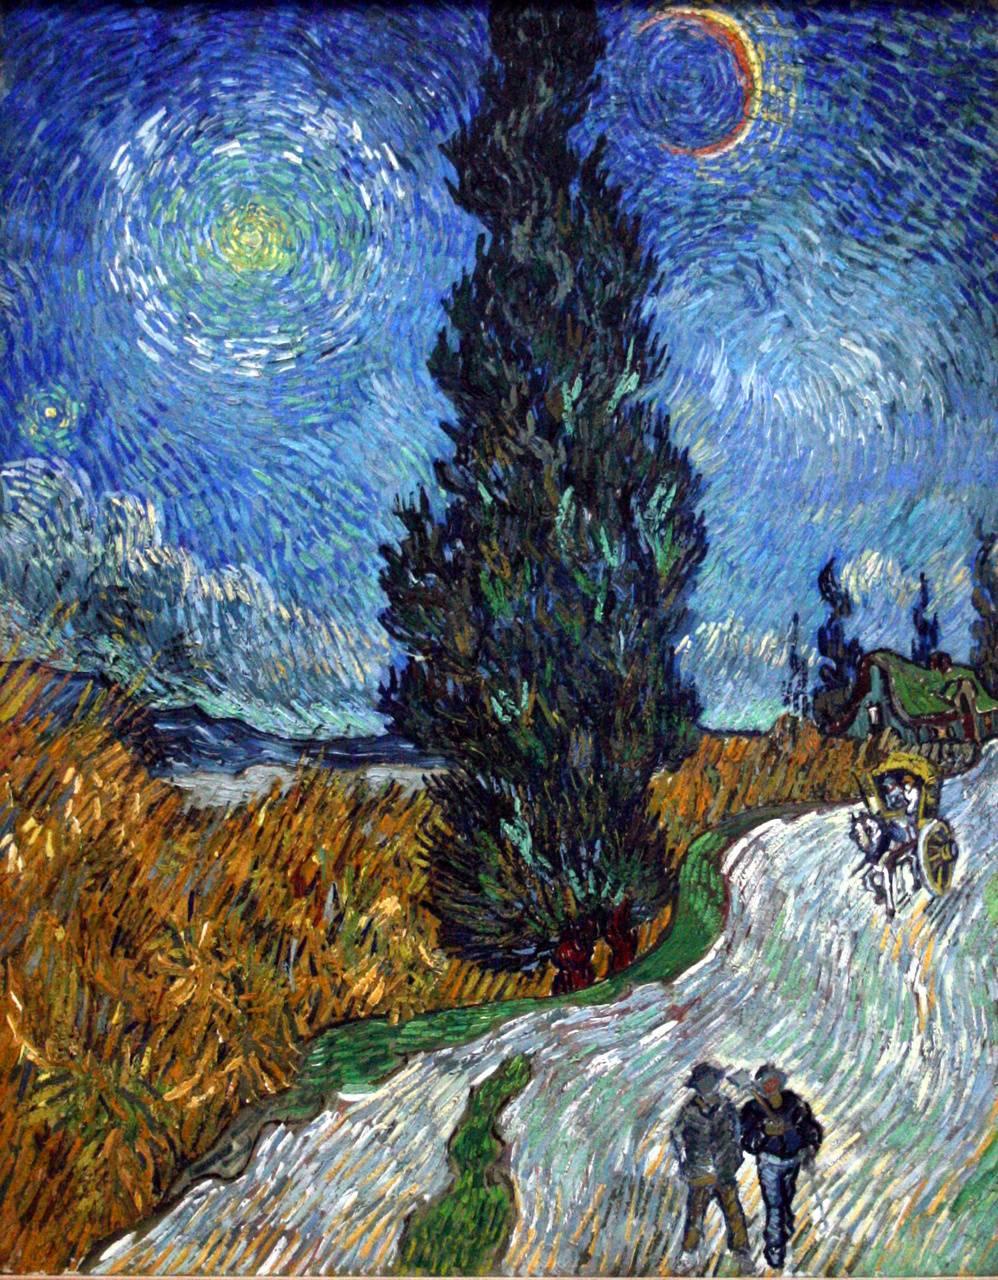 Van Gogh Wallpaper By Huseyinseyhann 84 Free On Zedge